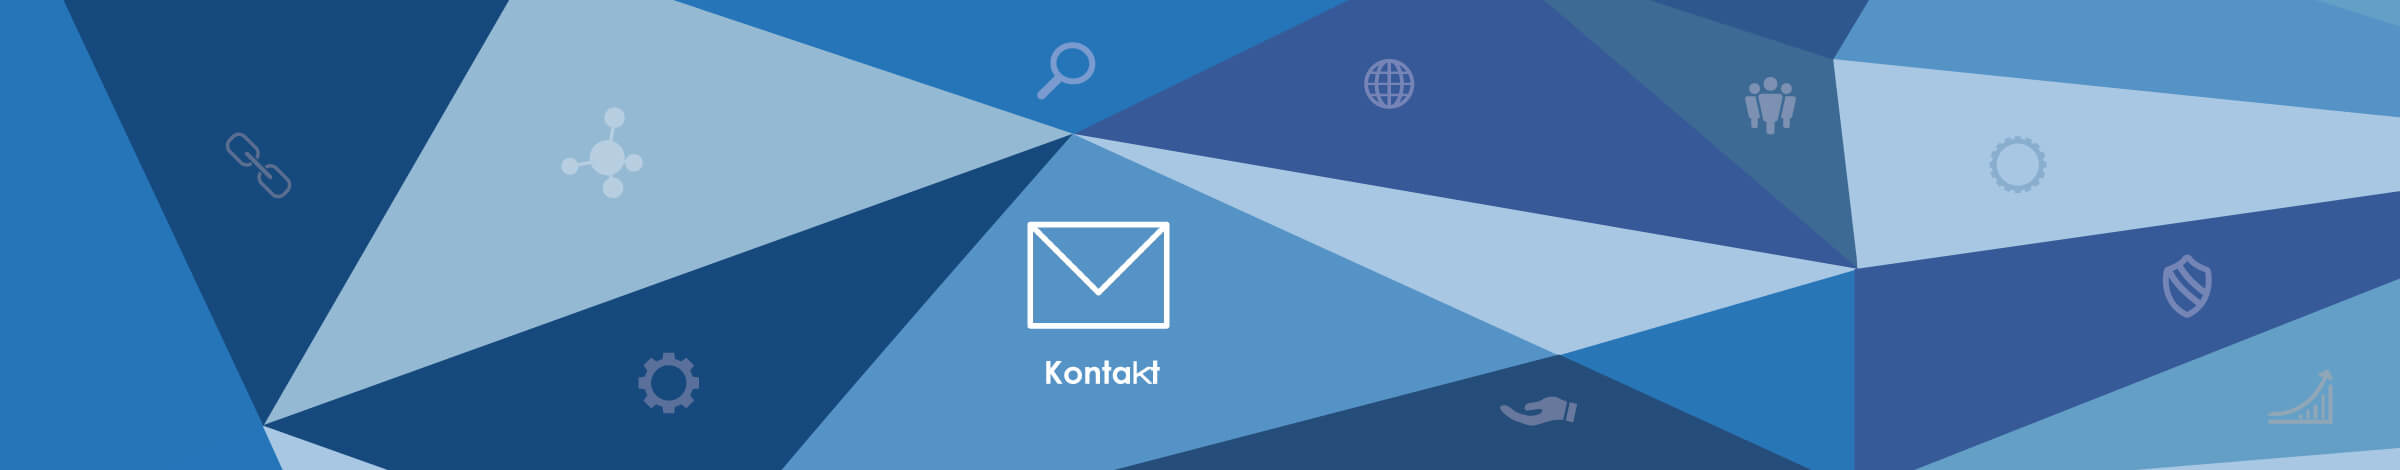 web_updates_kmu_wuk-ch_Kontakt